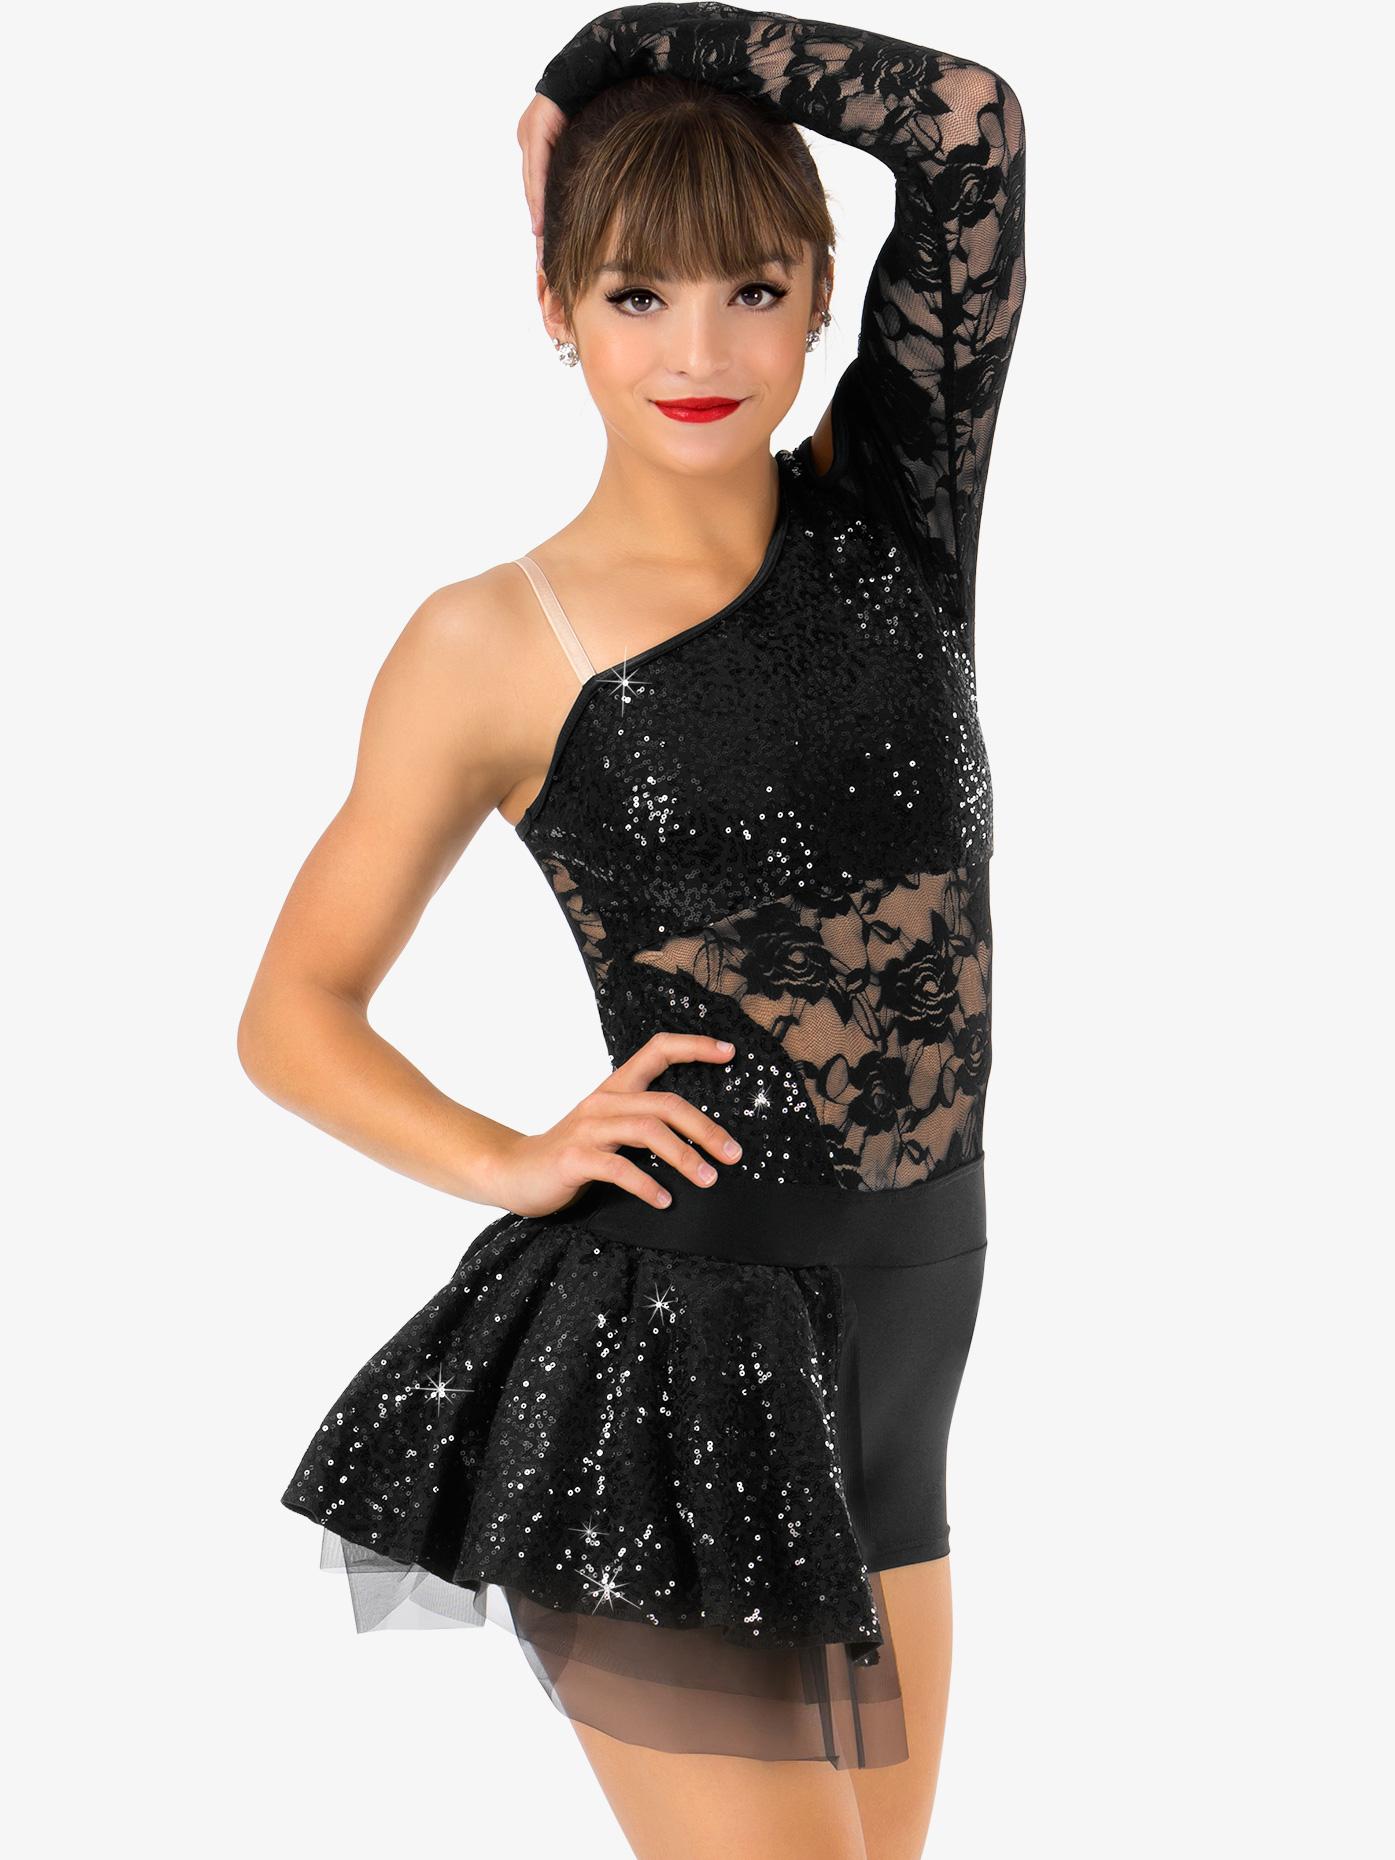 Elisse by Double Platinum Womens Lace Asymmetrical Bustled Performance Shorty Unitard N7466